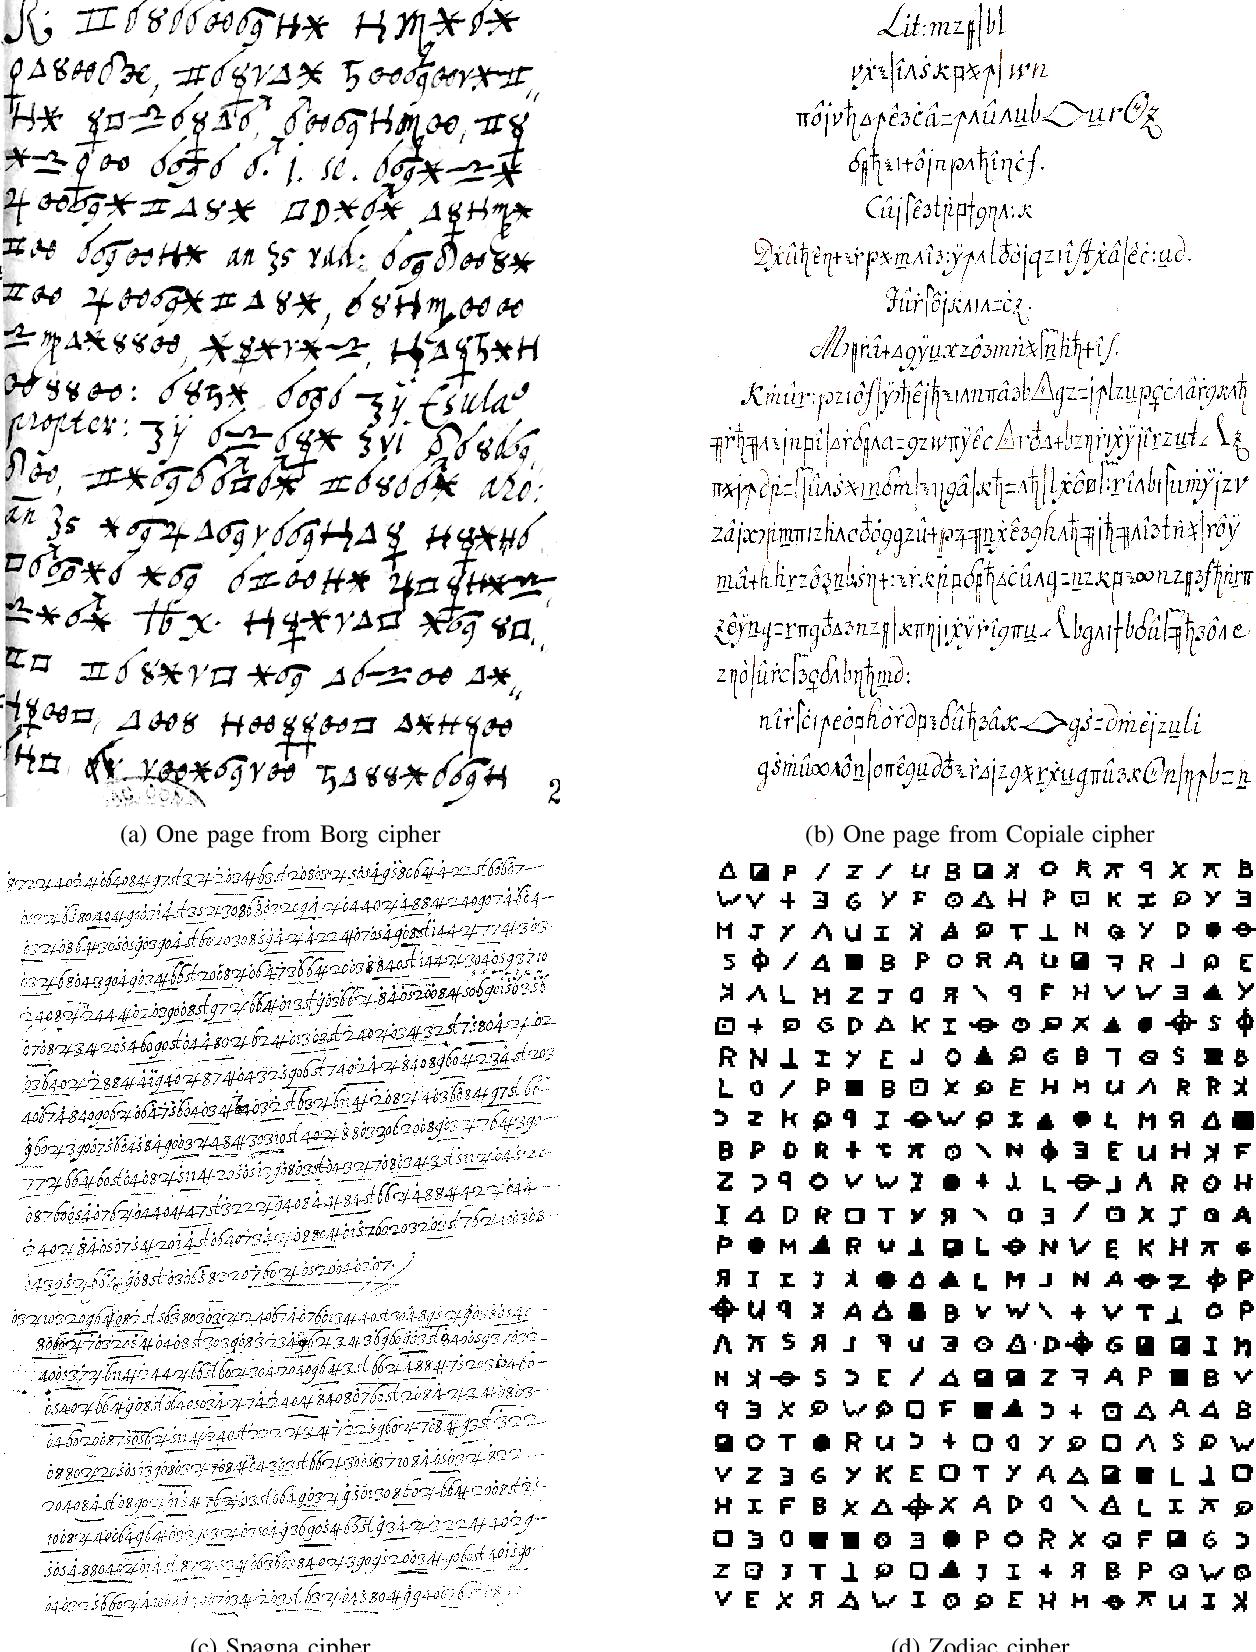 Figure 1 for Decipherment of Historical Manuscript Images